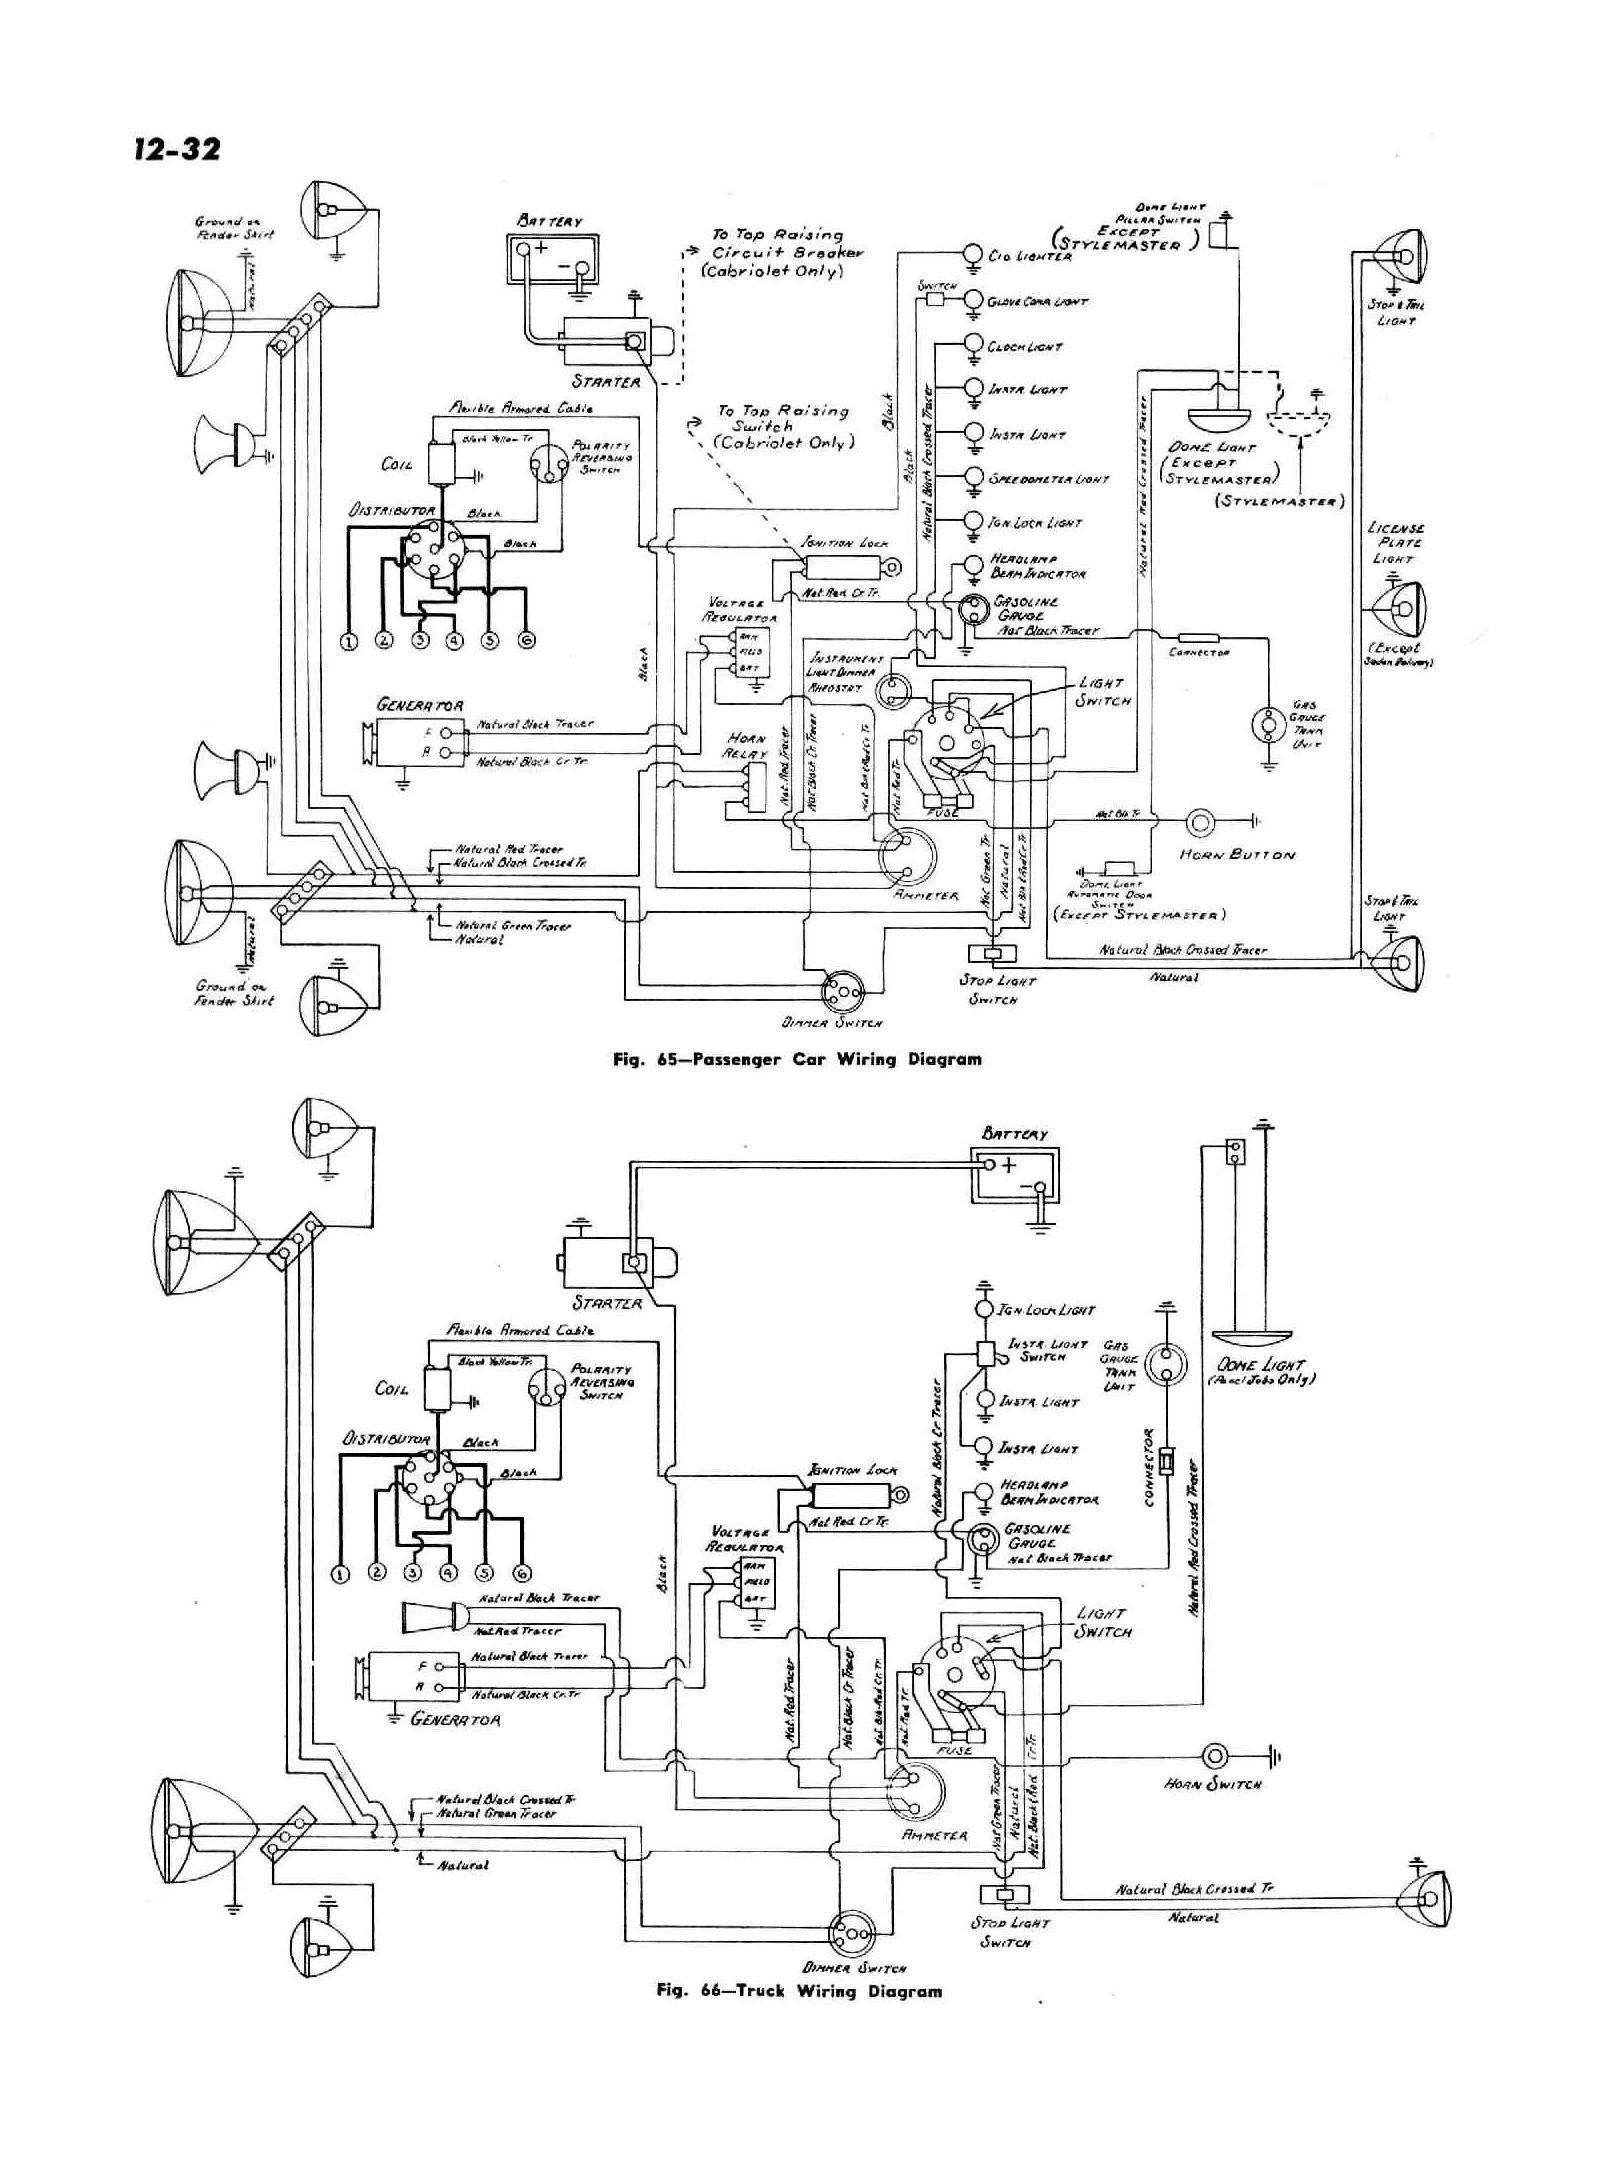 1950 chevy truck wiring diagram on 1959 chevy truck wiring diagram